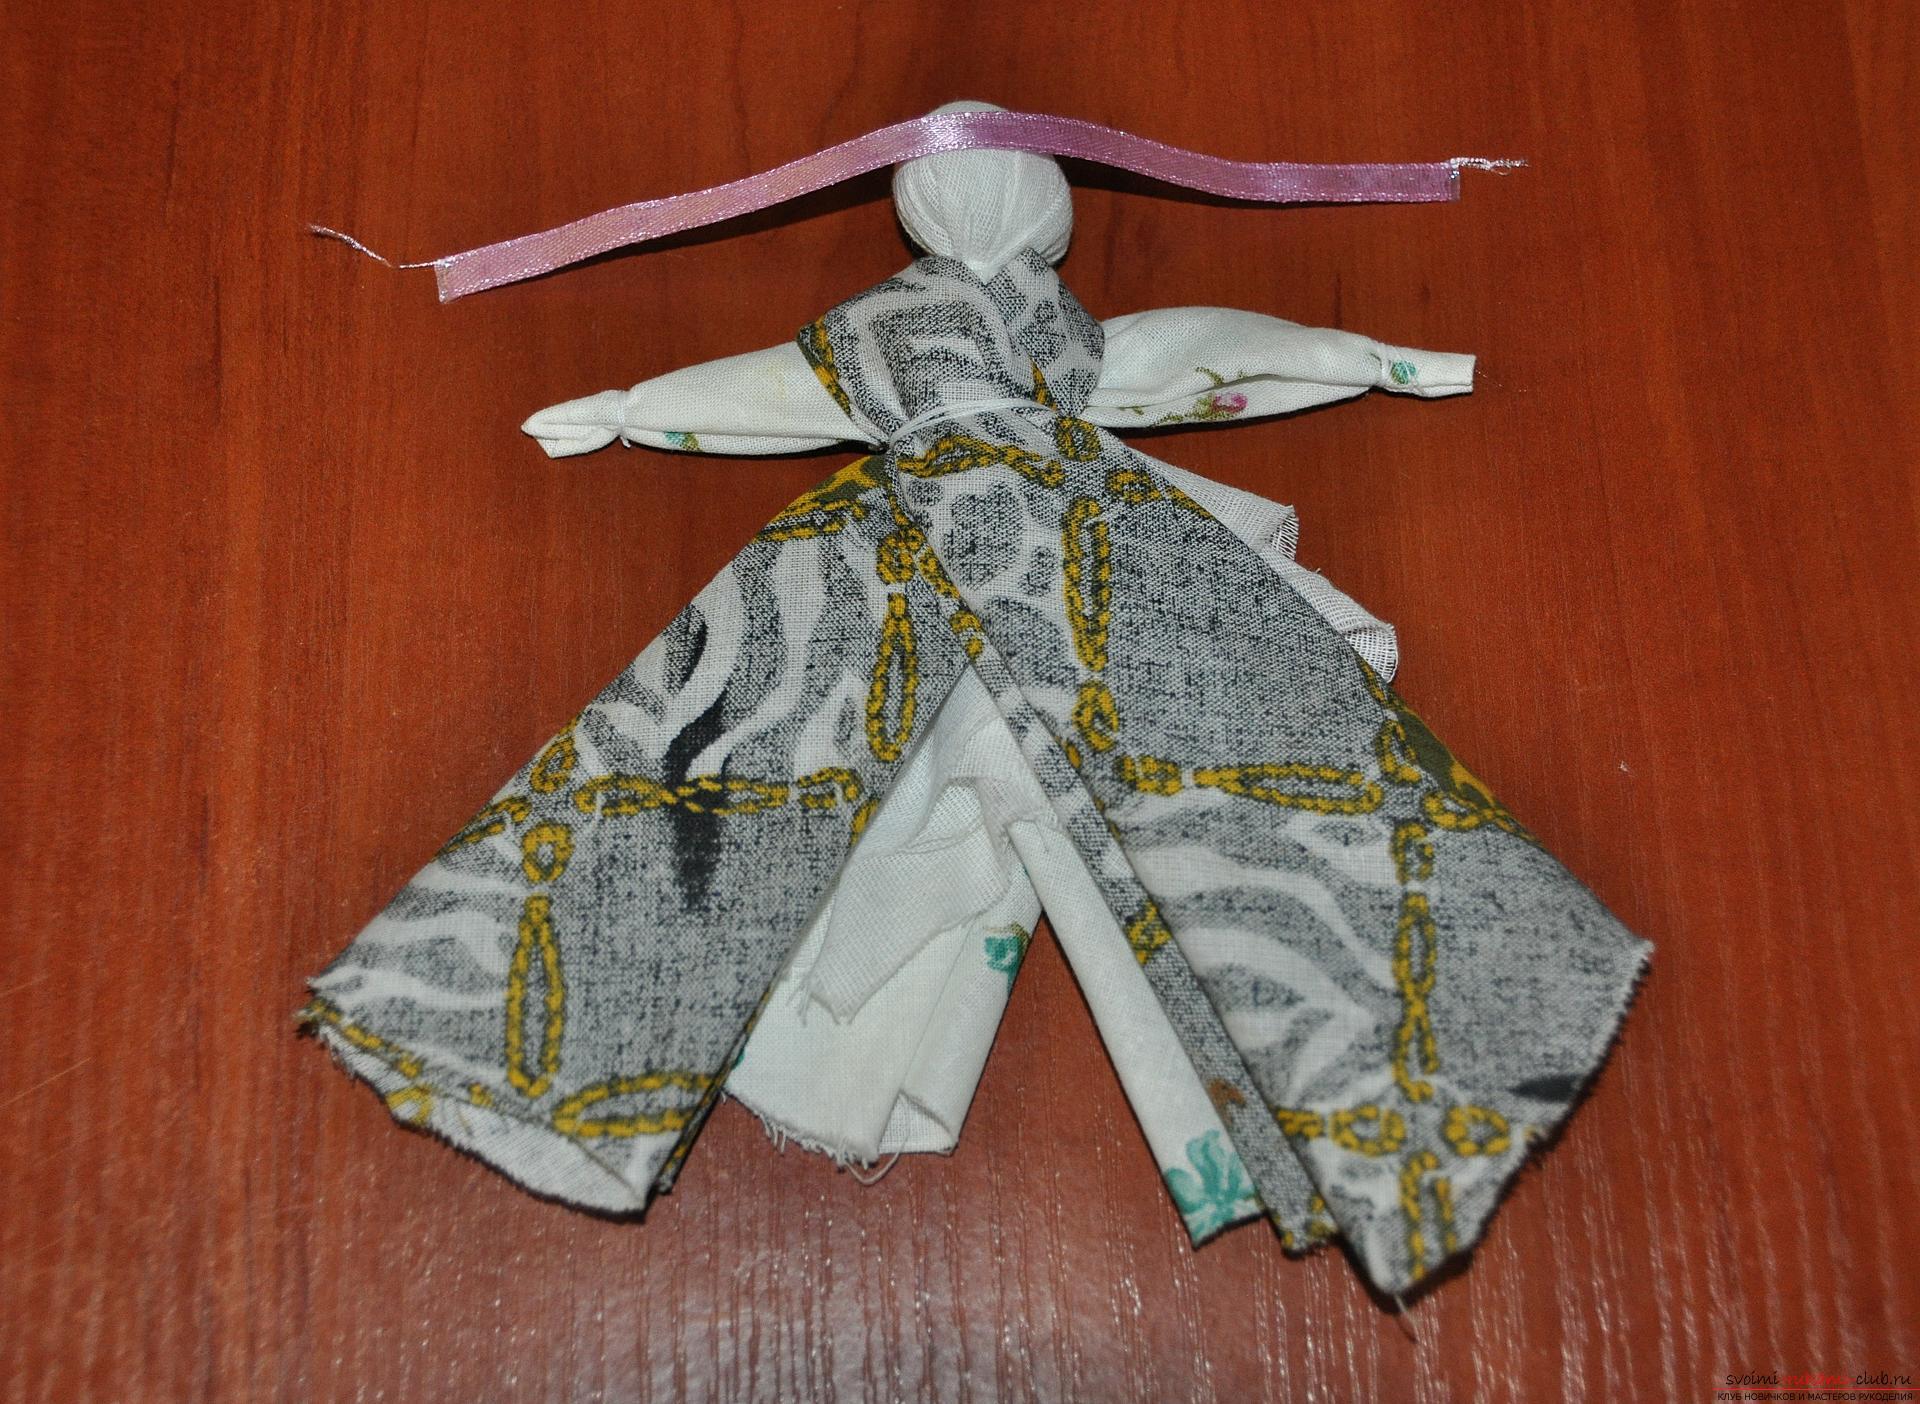 Этот мастер-класс научит как изготовить своими руками куклу-берегиню - столбушку. Фото №19